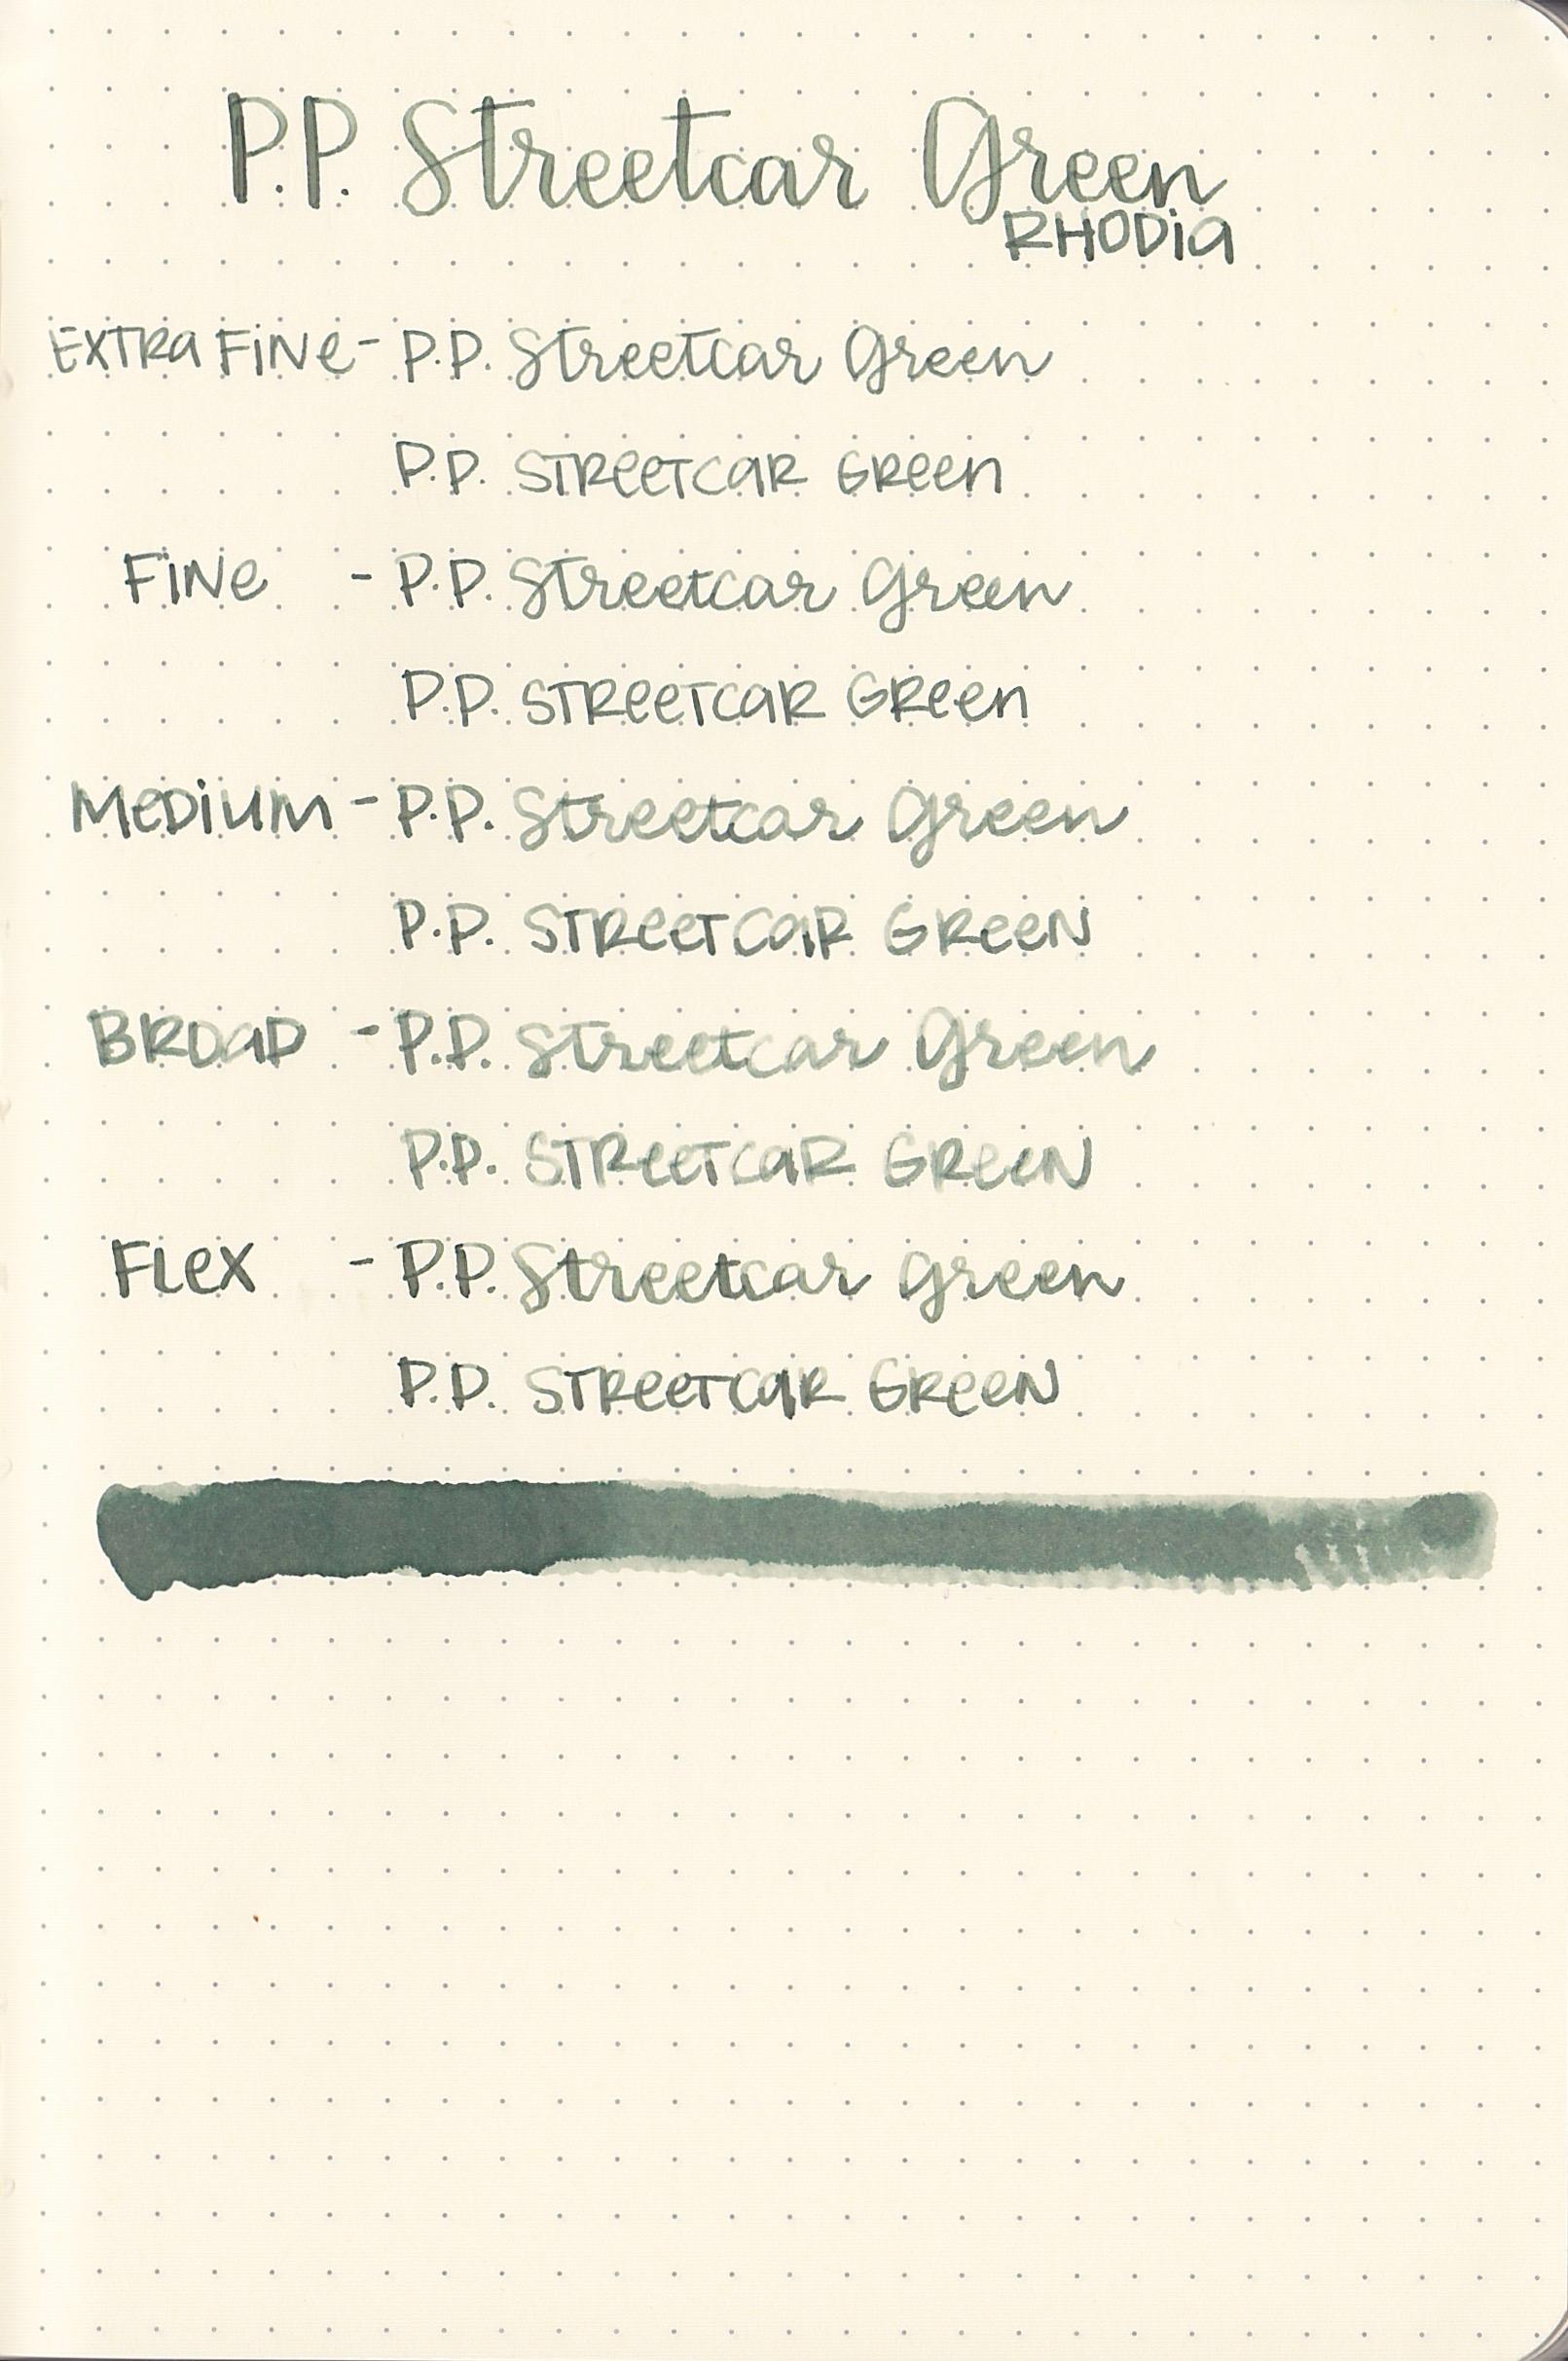 PPStreetcarGreen - 14.jpg